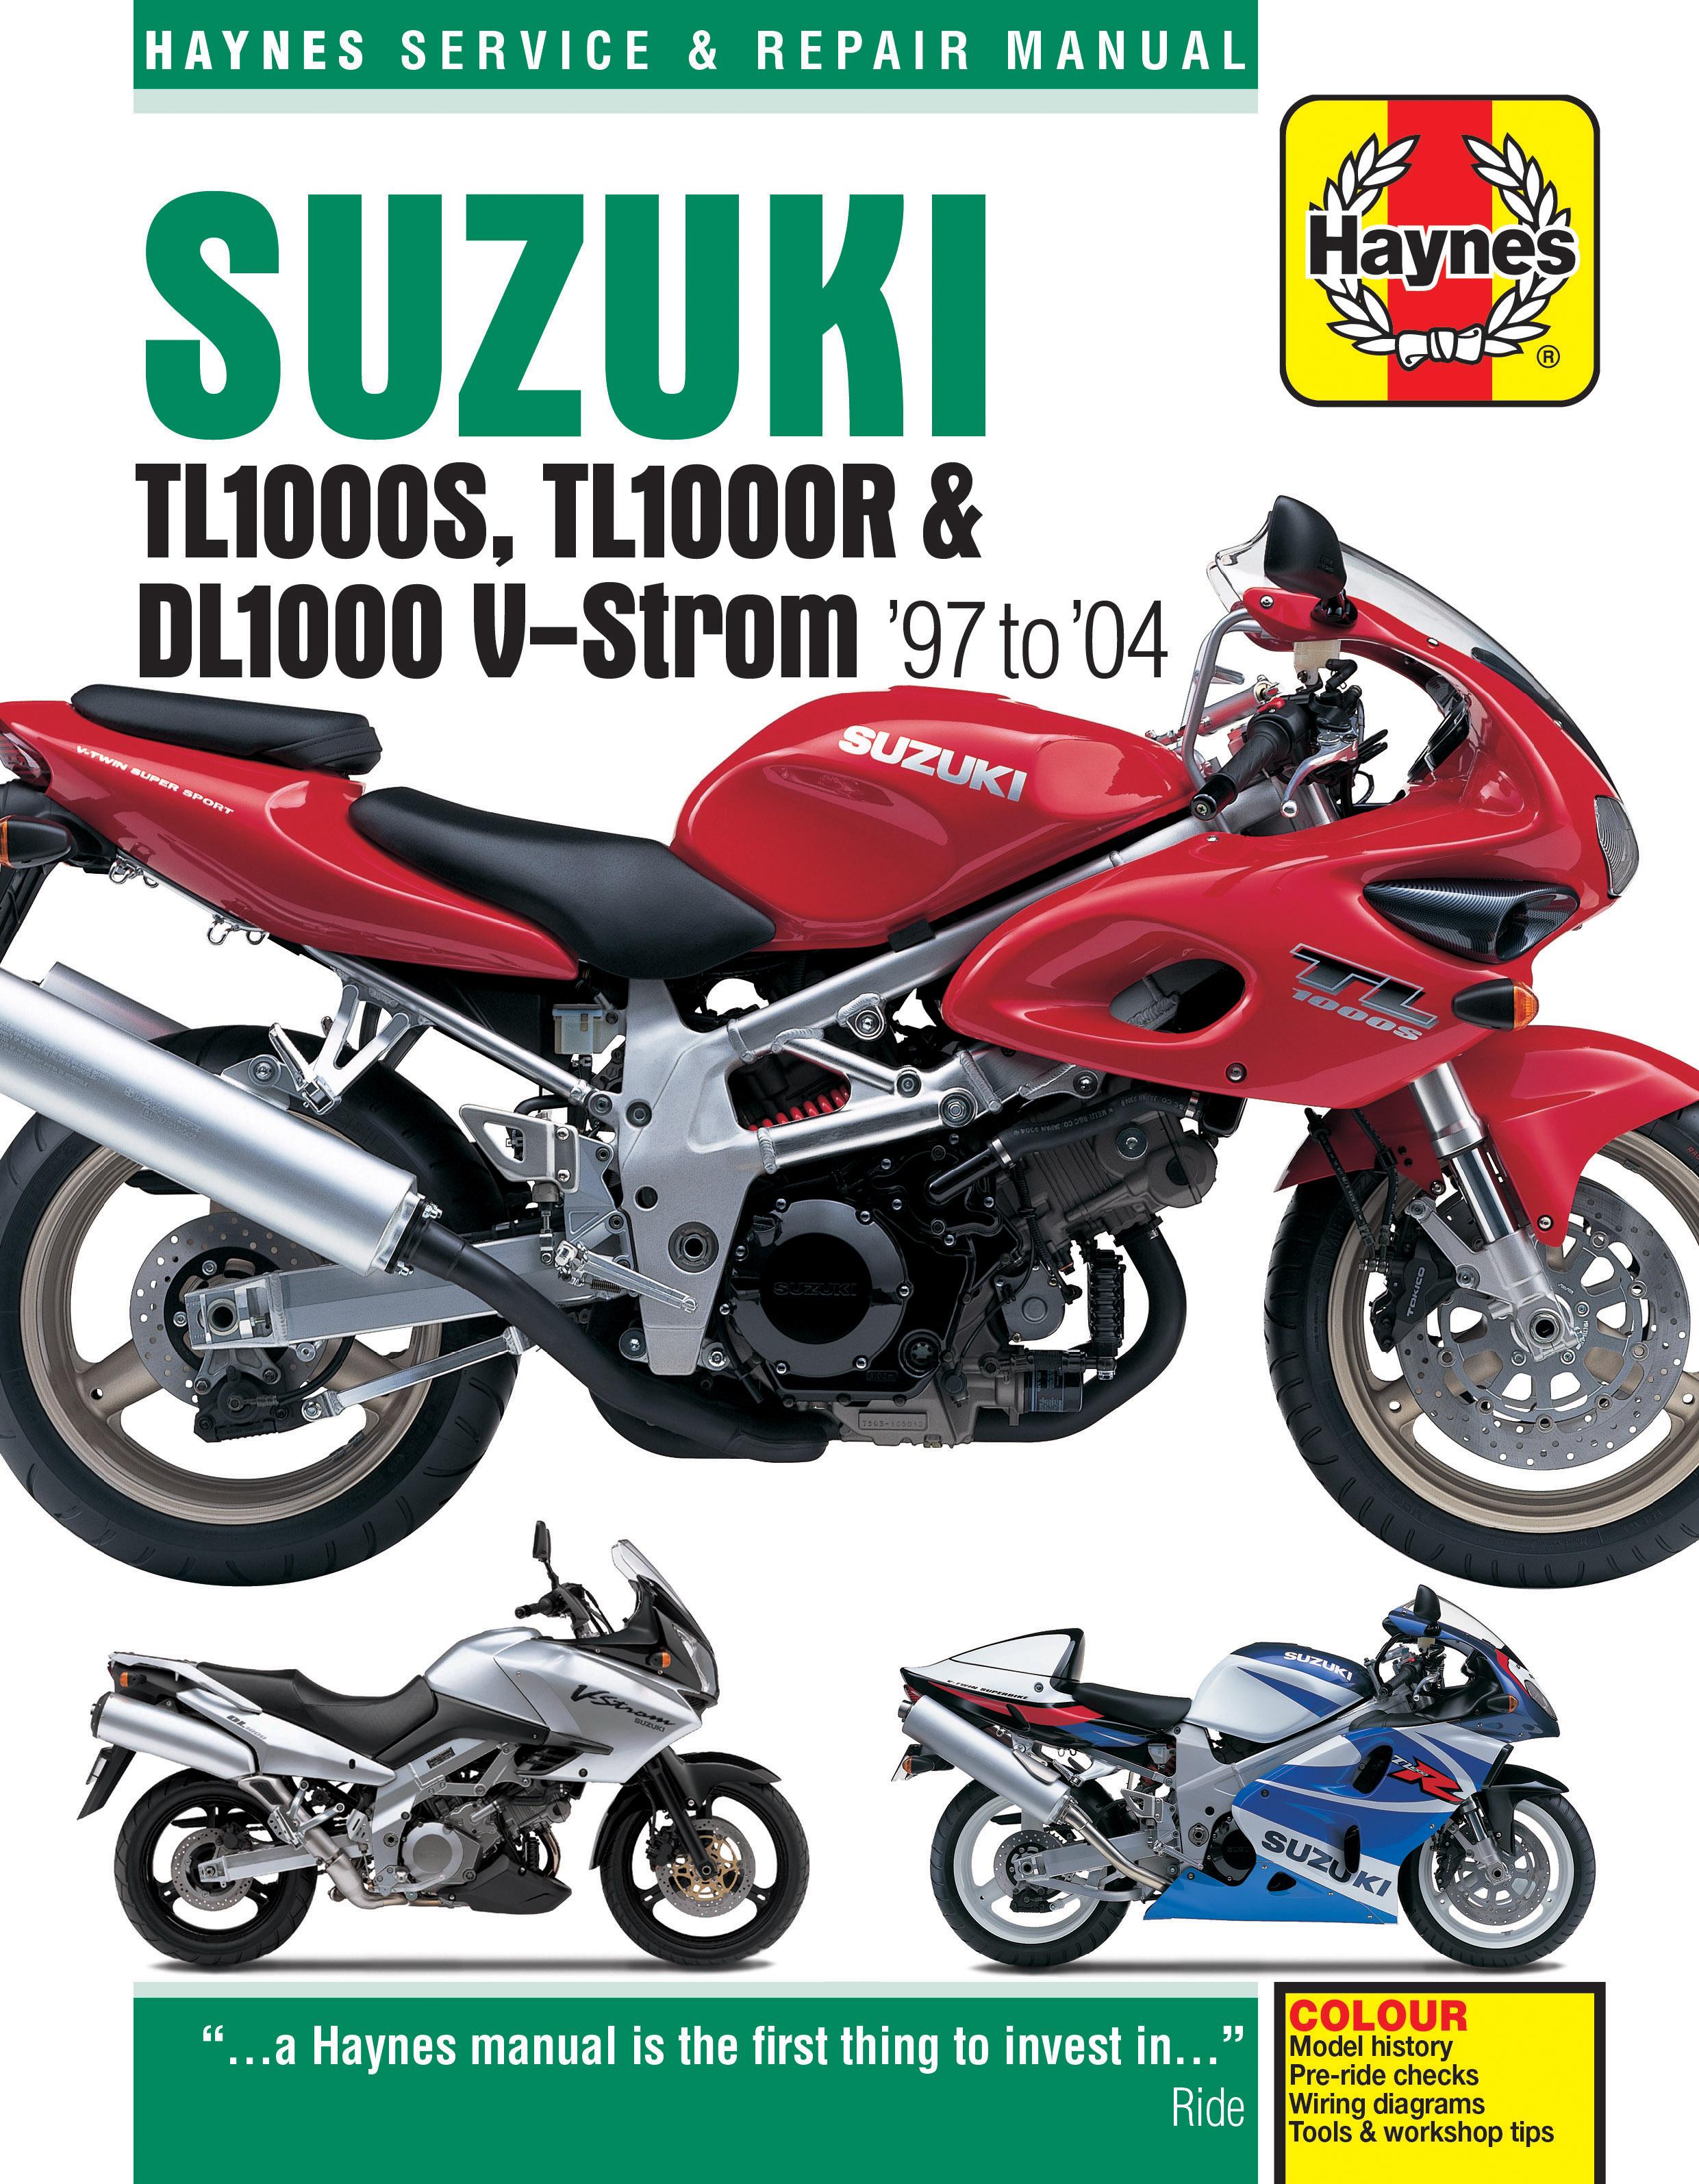 Suzuki TL1000S/R & DL1000 V-Strom (97 - 04) Haynes Repair Manual ...